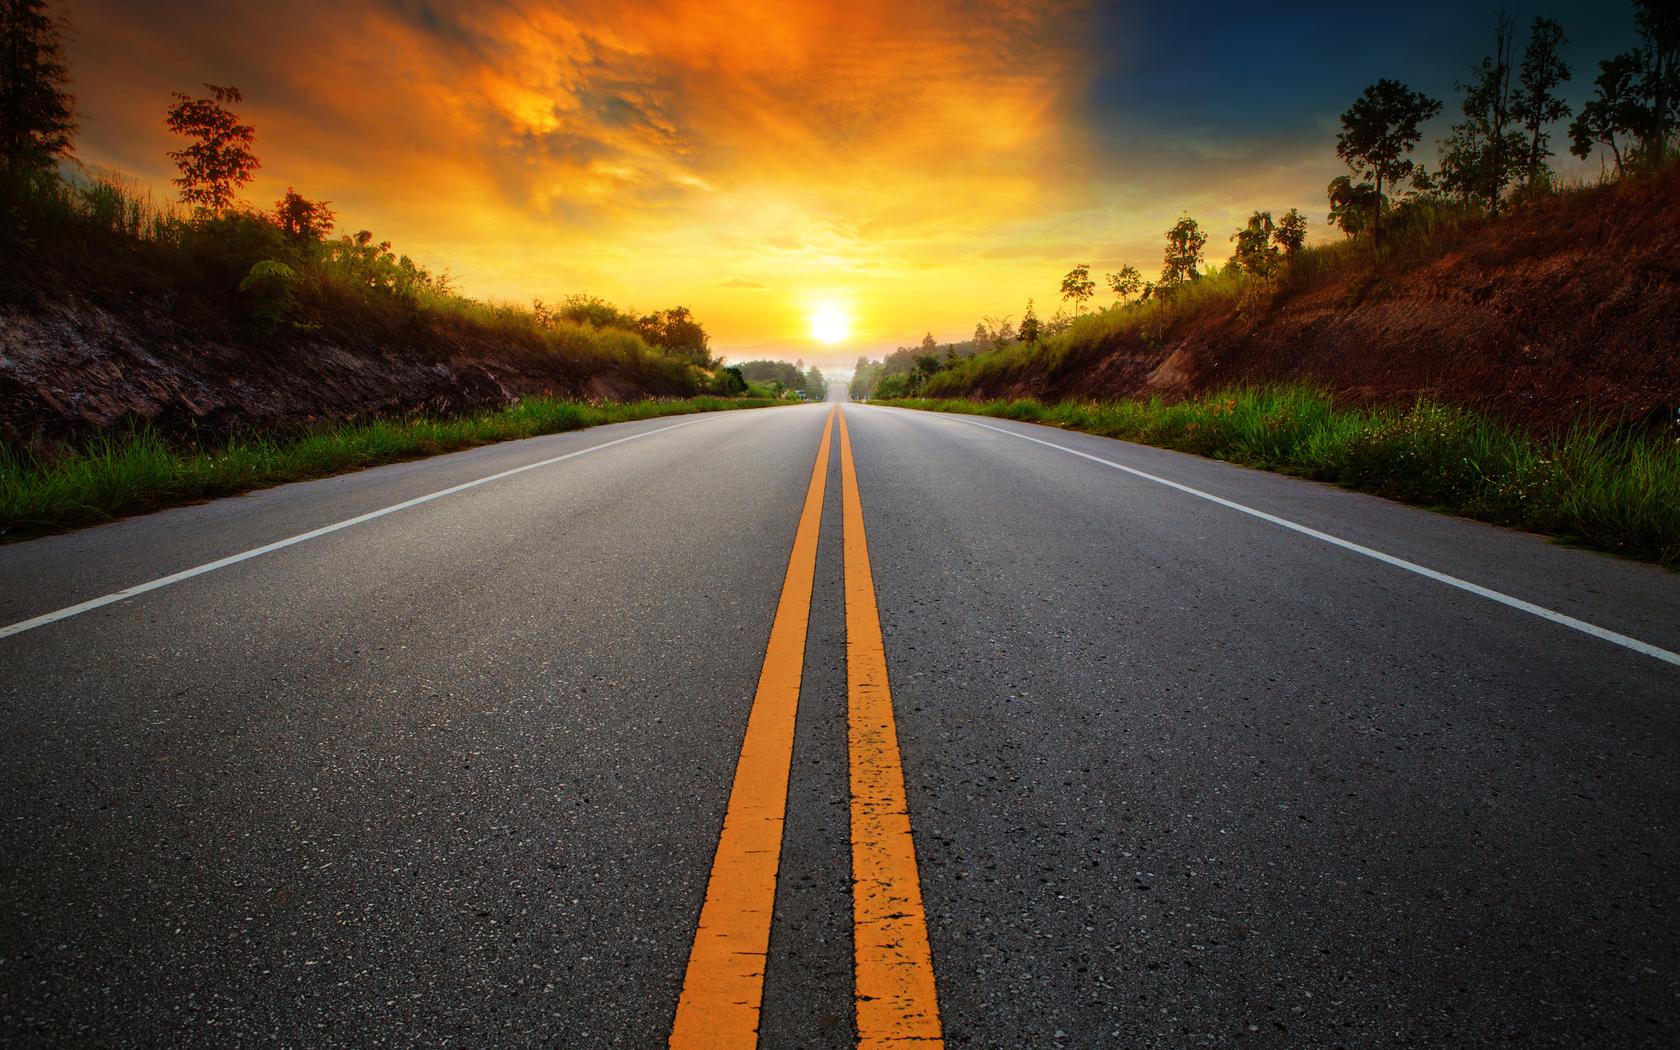 sunrise-sunset-road-9m.jpg